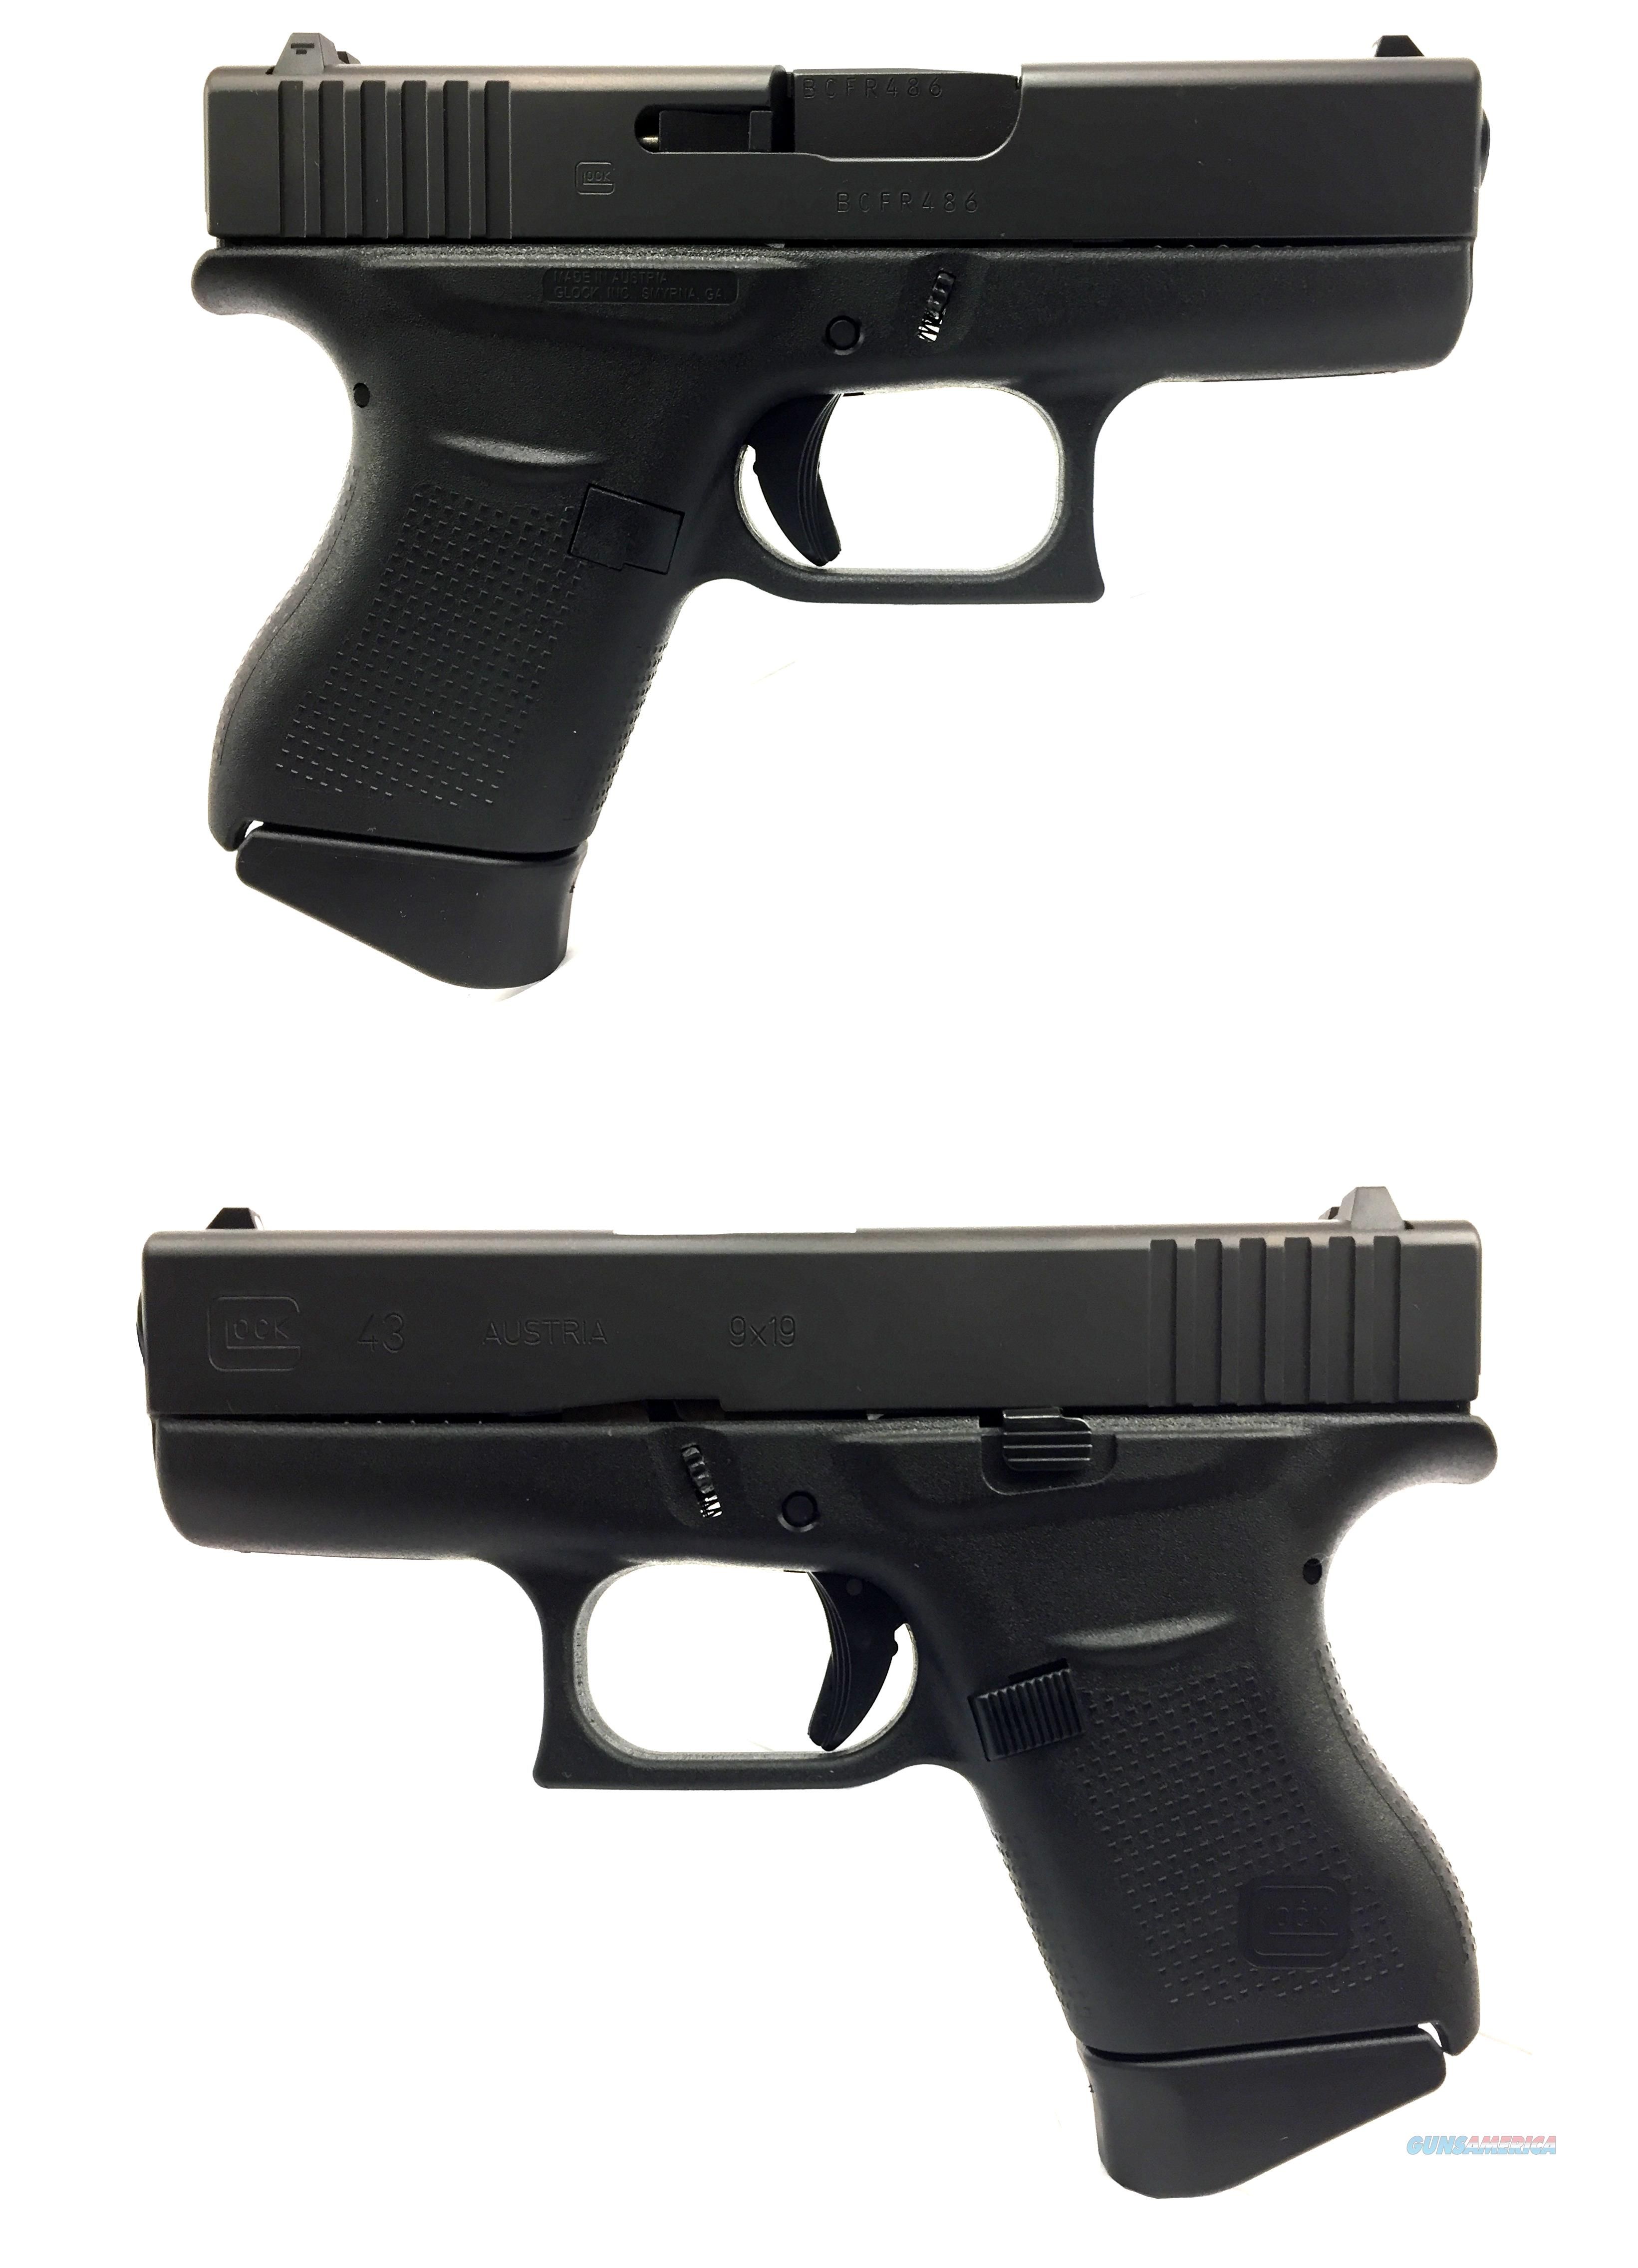 Glock 43 Semi-Automatic Pistol  Guns > Pistols > Glock Pistols > 43/43X